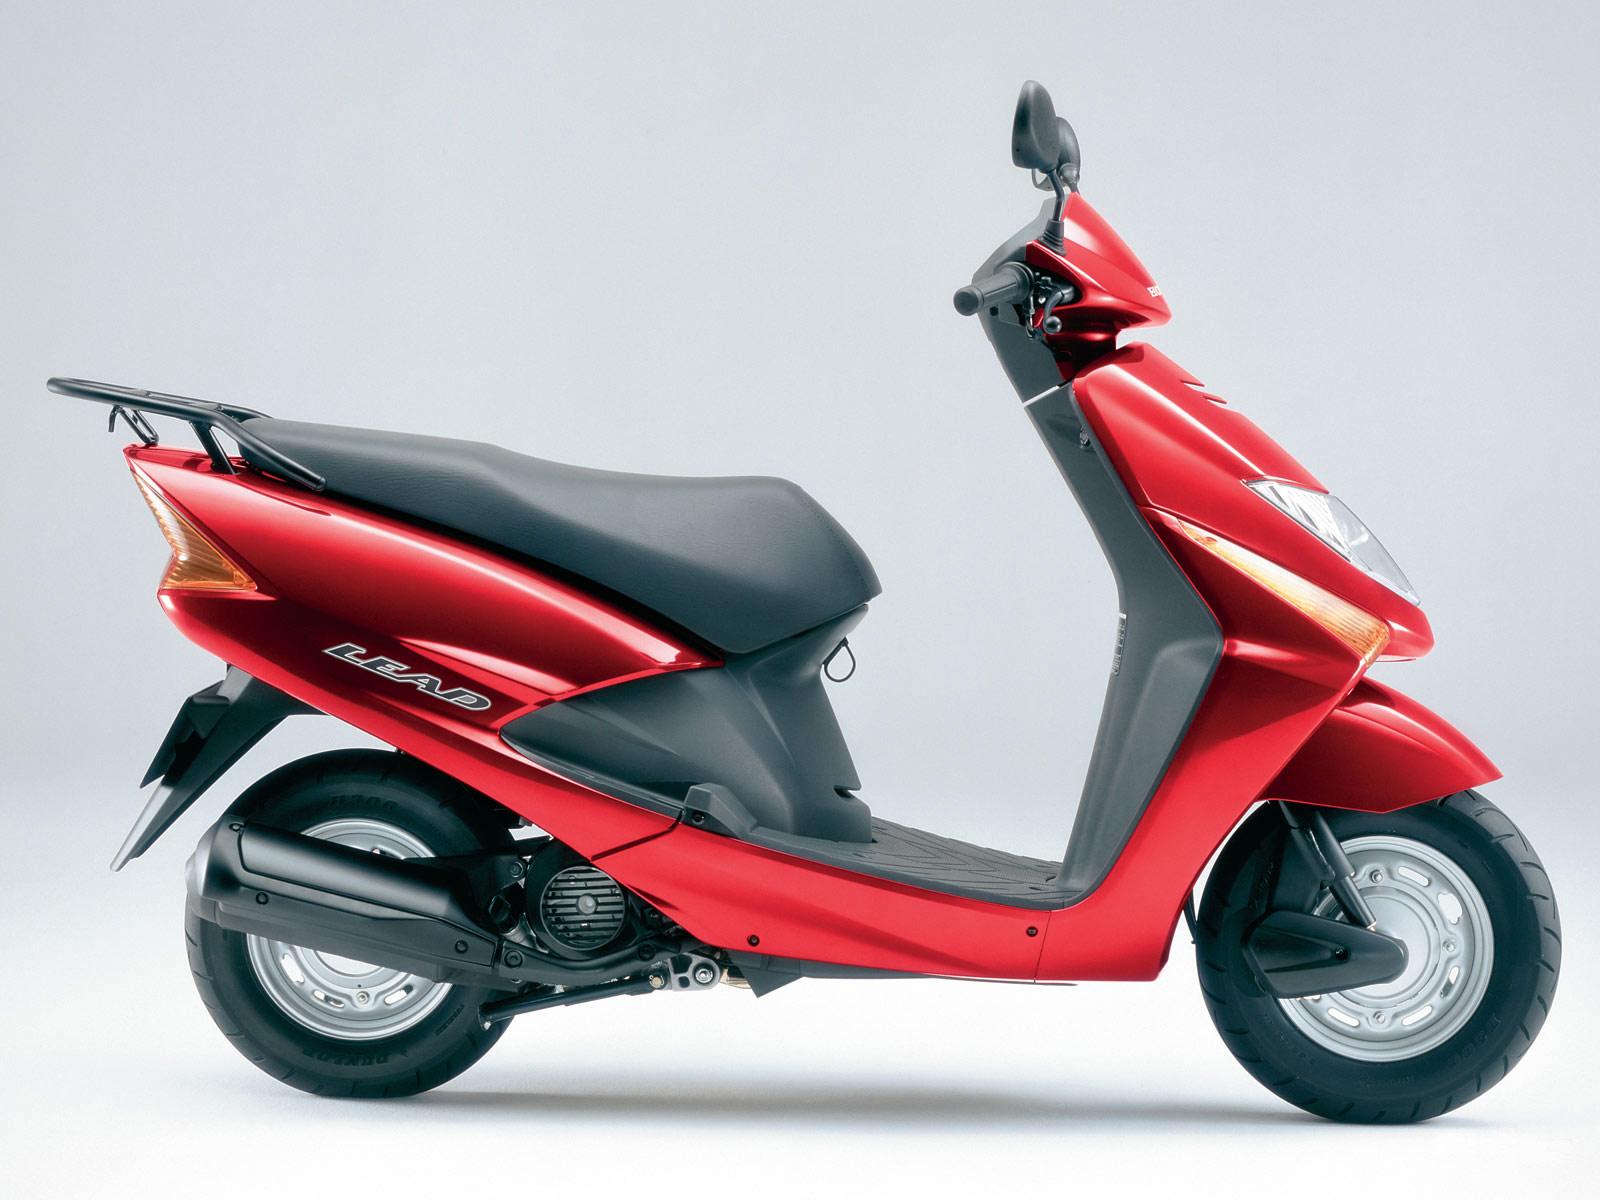 Honda SH SH 150 i (2005 - 08) Usate - Annunci inSella